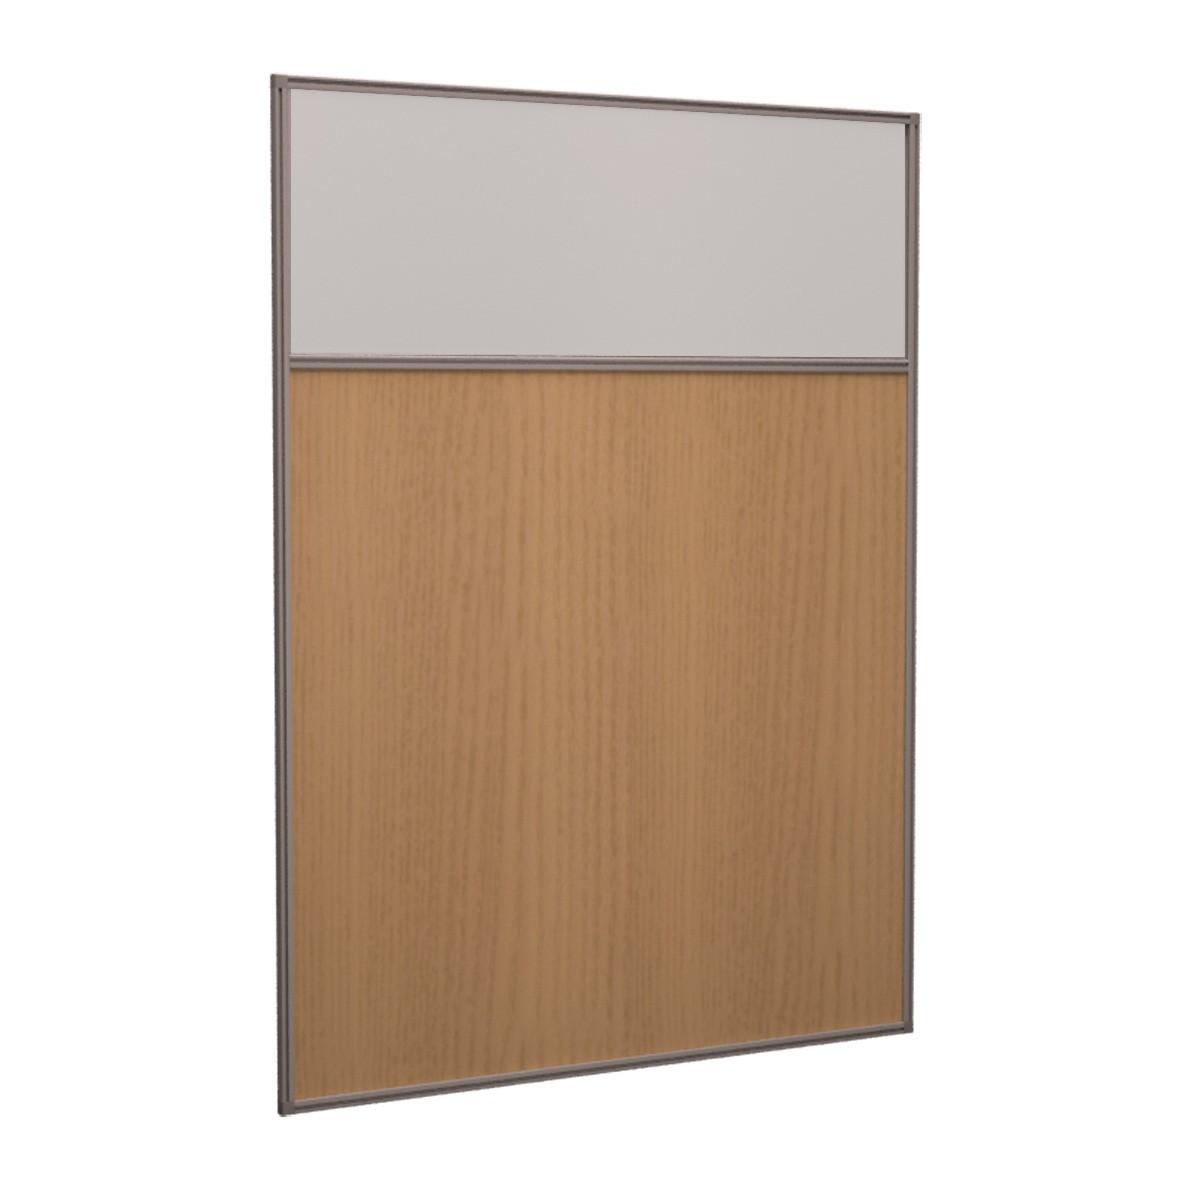 cloison amovible bureau vitree 20171012075117. Black Bedroom Furniture Sets. Home Design Ideas